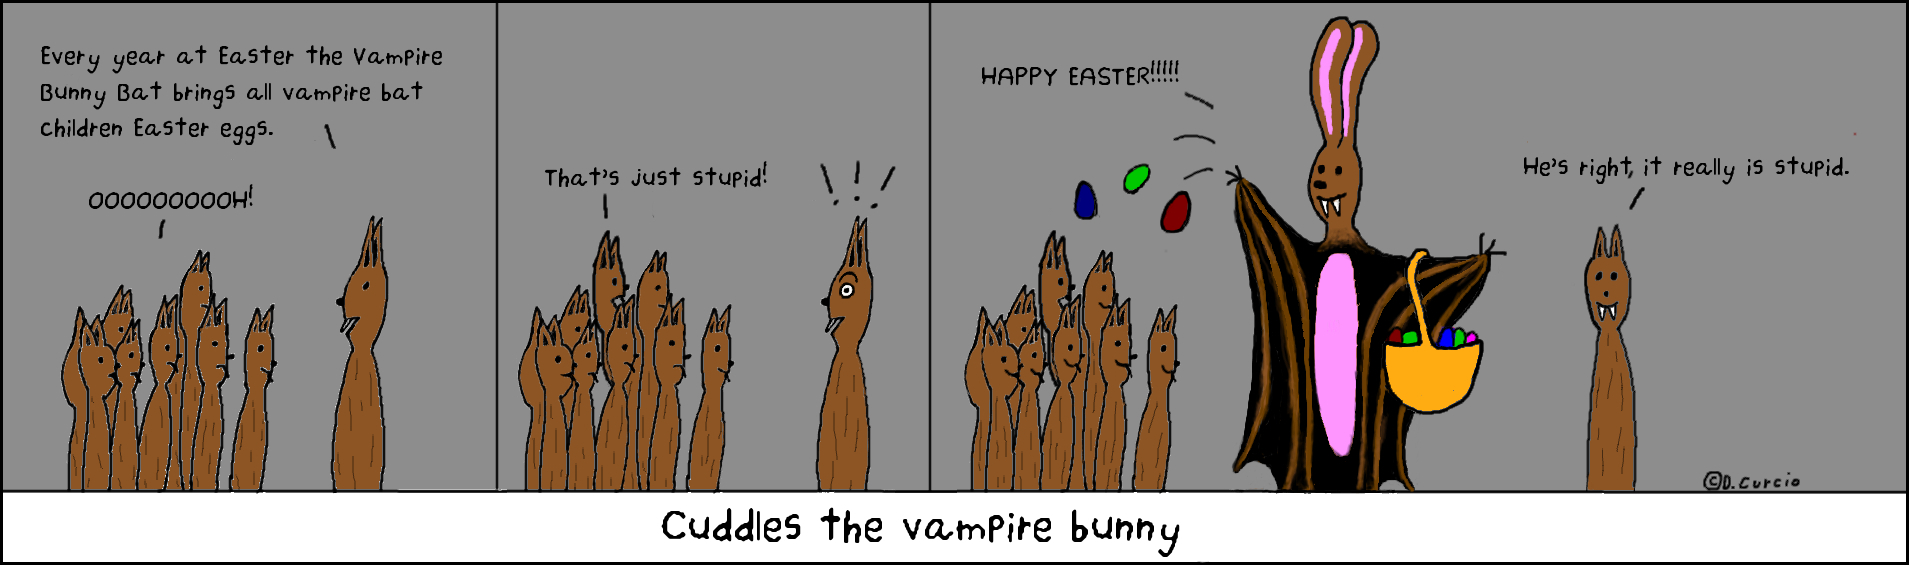 Happy Easter Bunny Bat